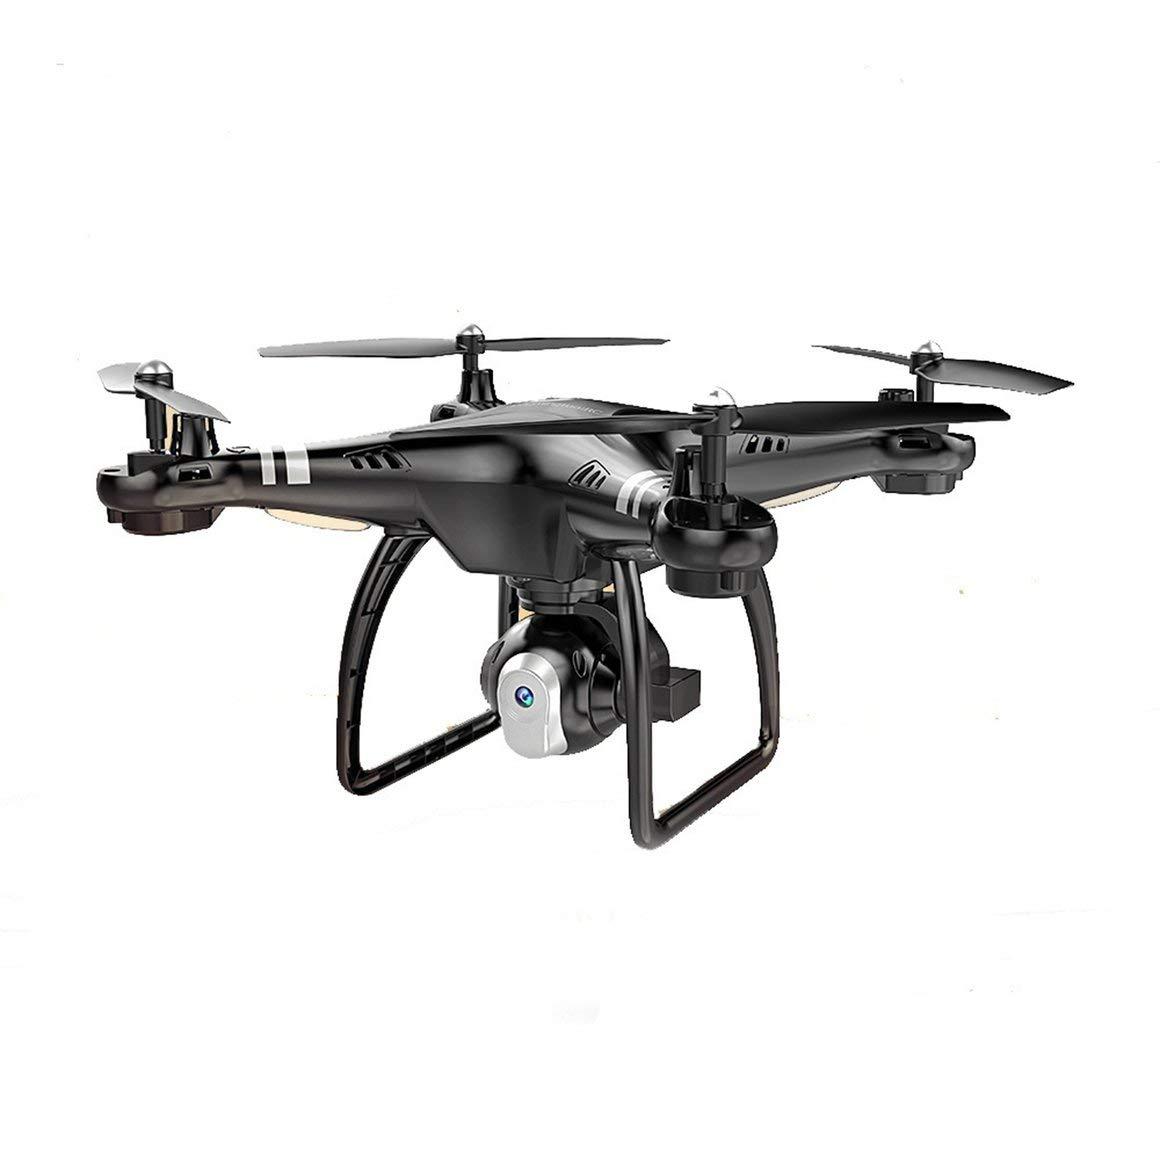 Funnyrunstore X8 RC Drone con HD Cámara de 3MP Altitud Mantenga sin Modo Modo 2.4G RC Quadcopter (Color: Negro)